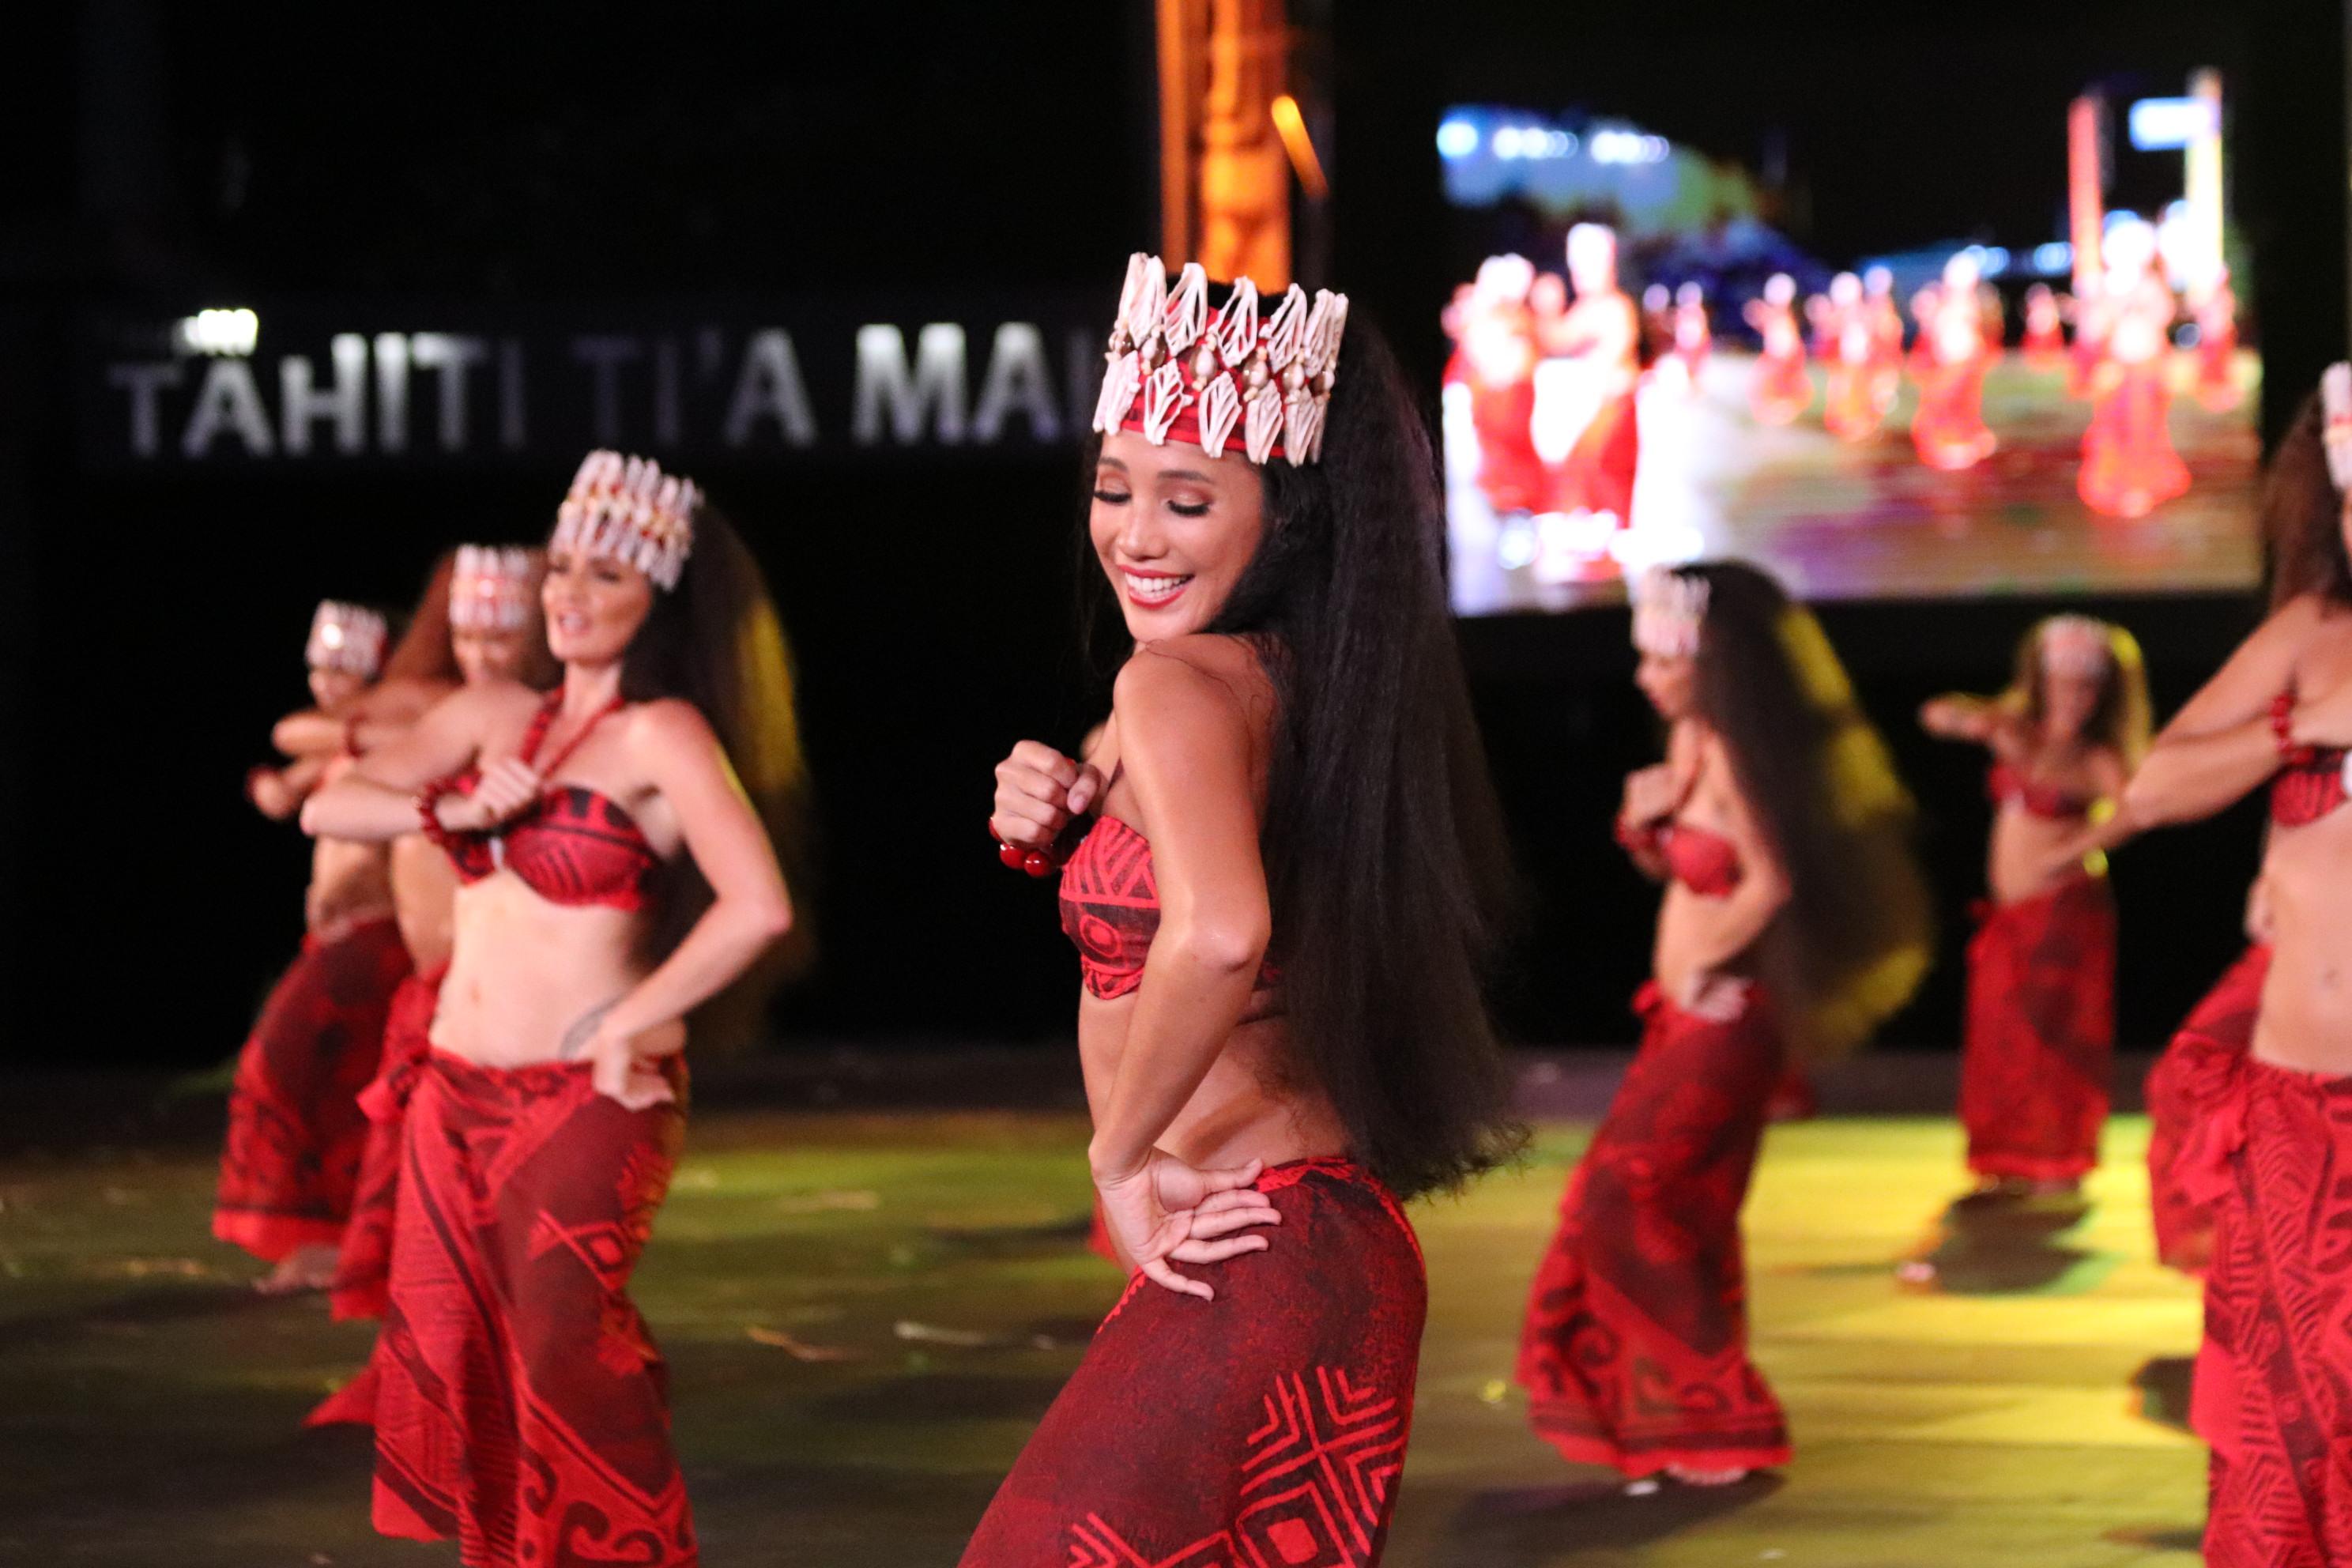 Tahiti-ora_2743